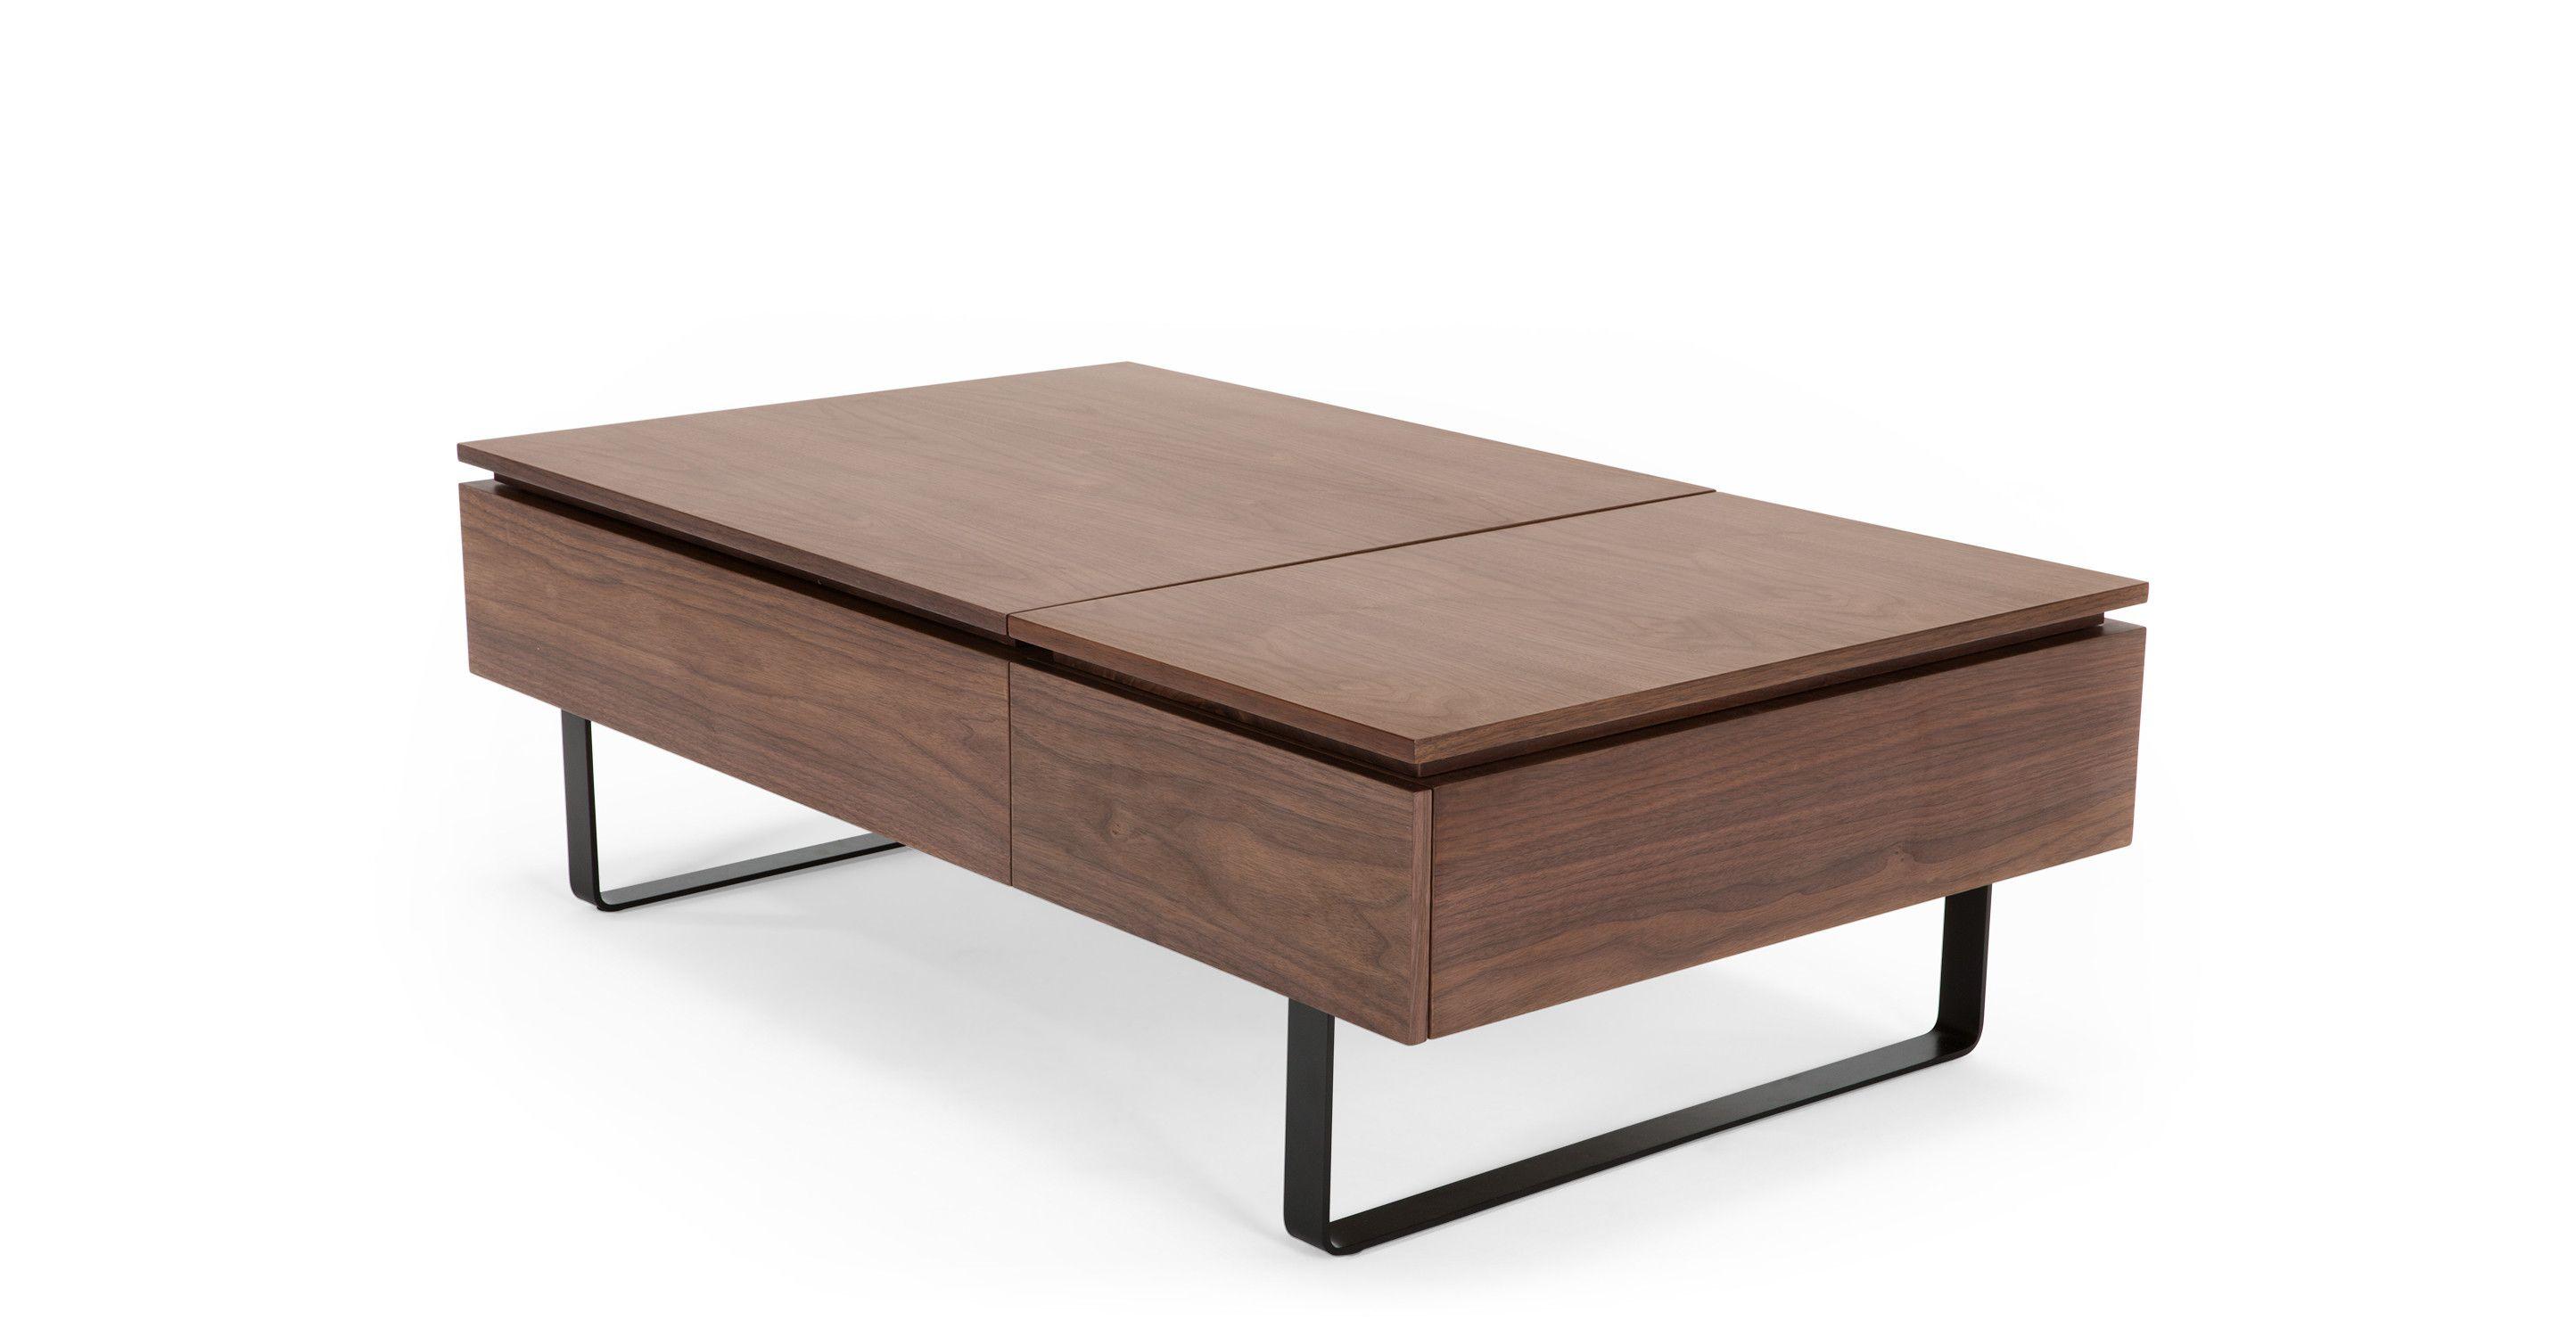 Flippa Functional Coffee Table with Storage Walnut from Madecom